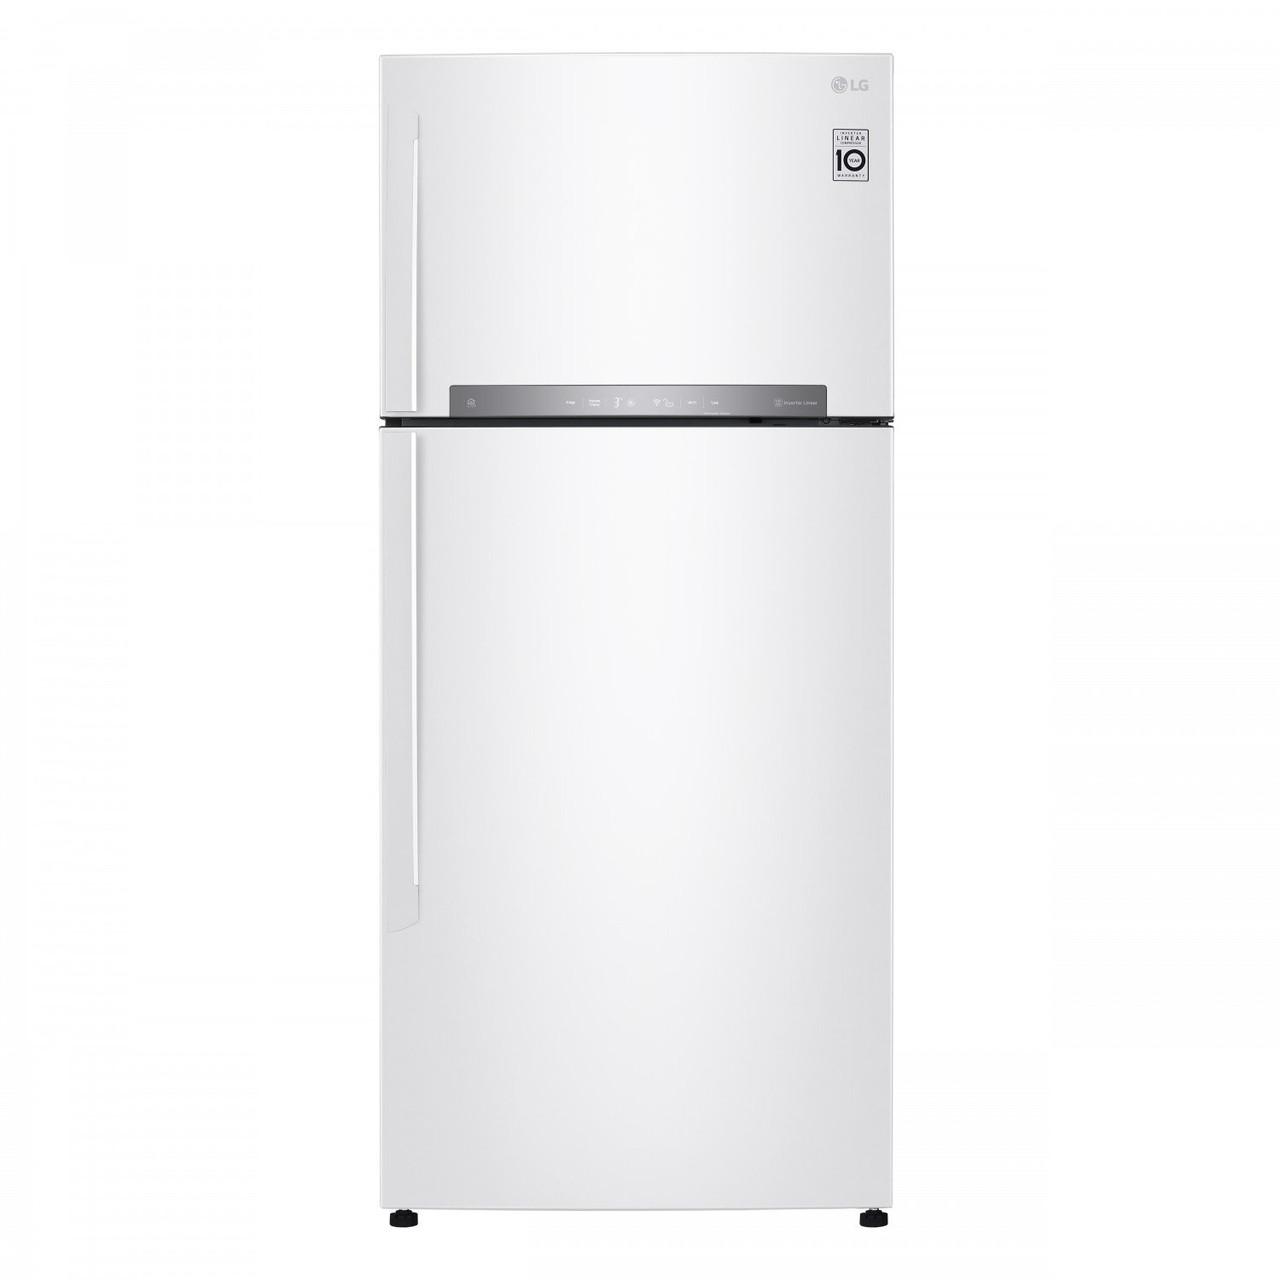 Двухкамерный холодильник Lg GN-H702HQHZ